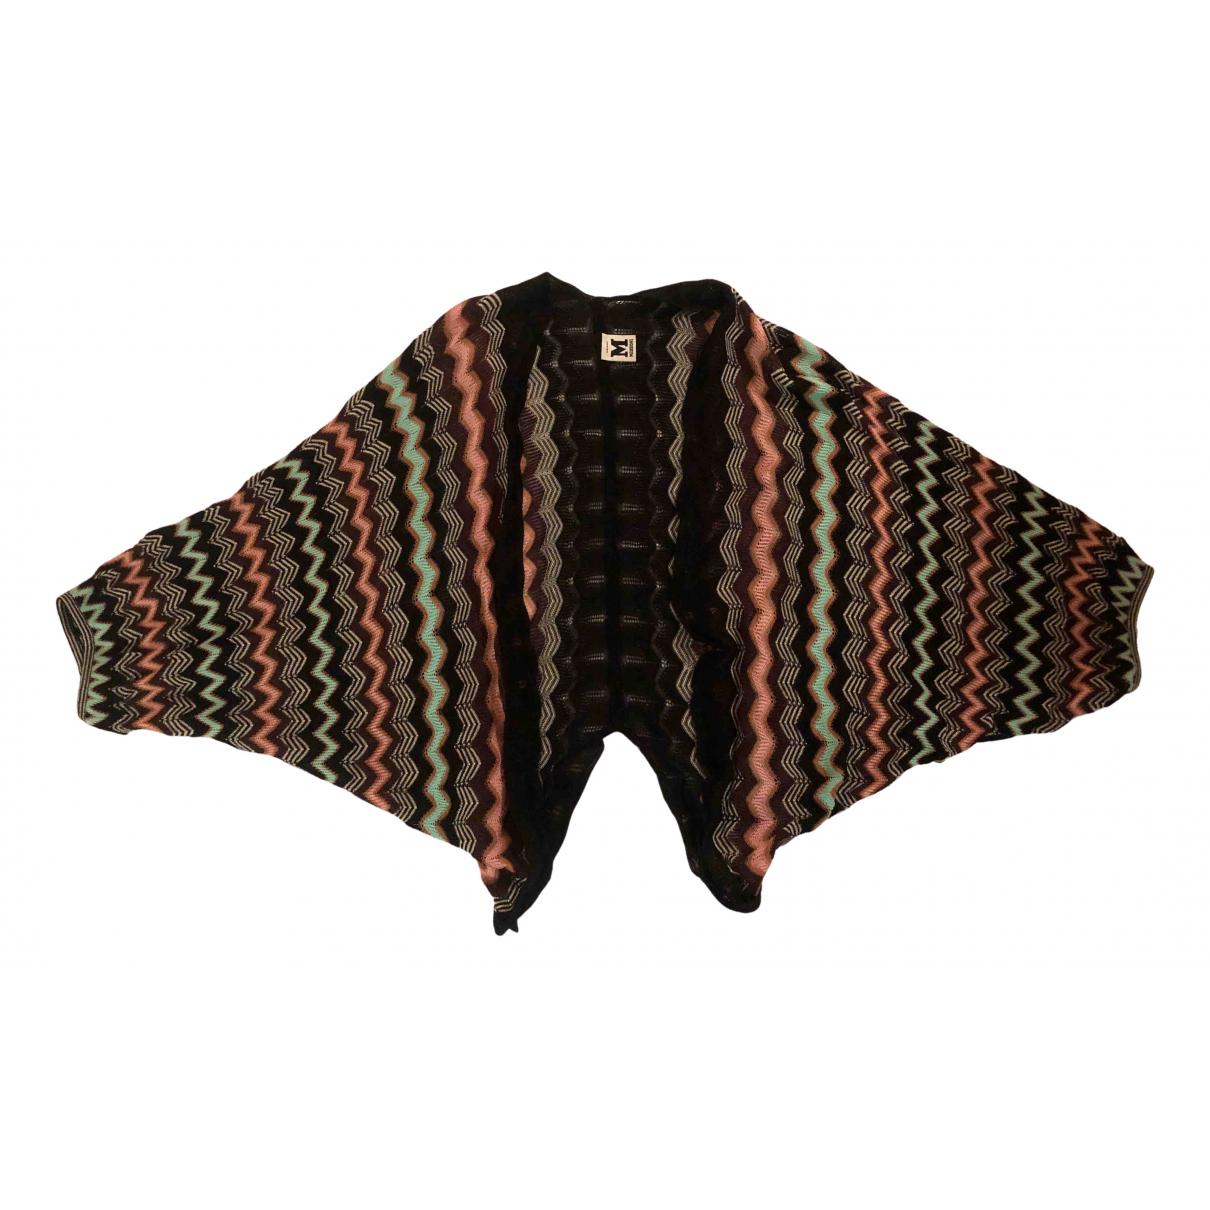 M Missoni \N Multicolour jacket for Women 44 IT